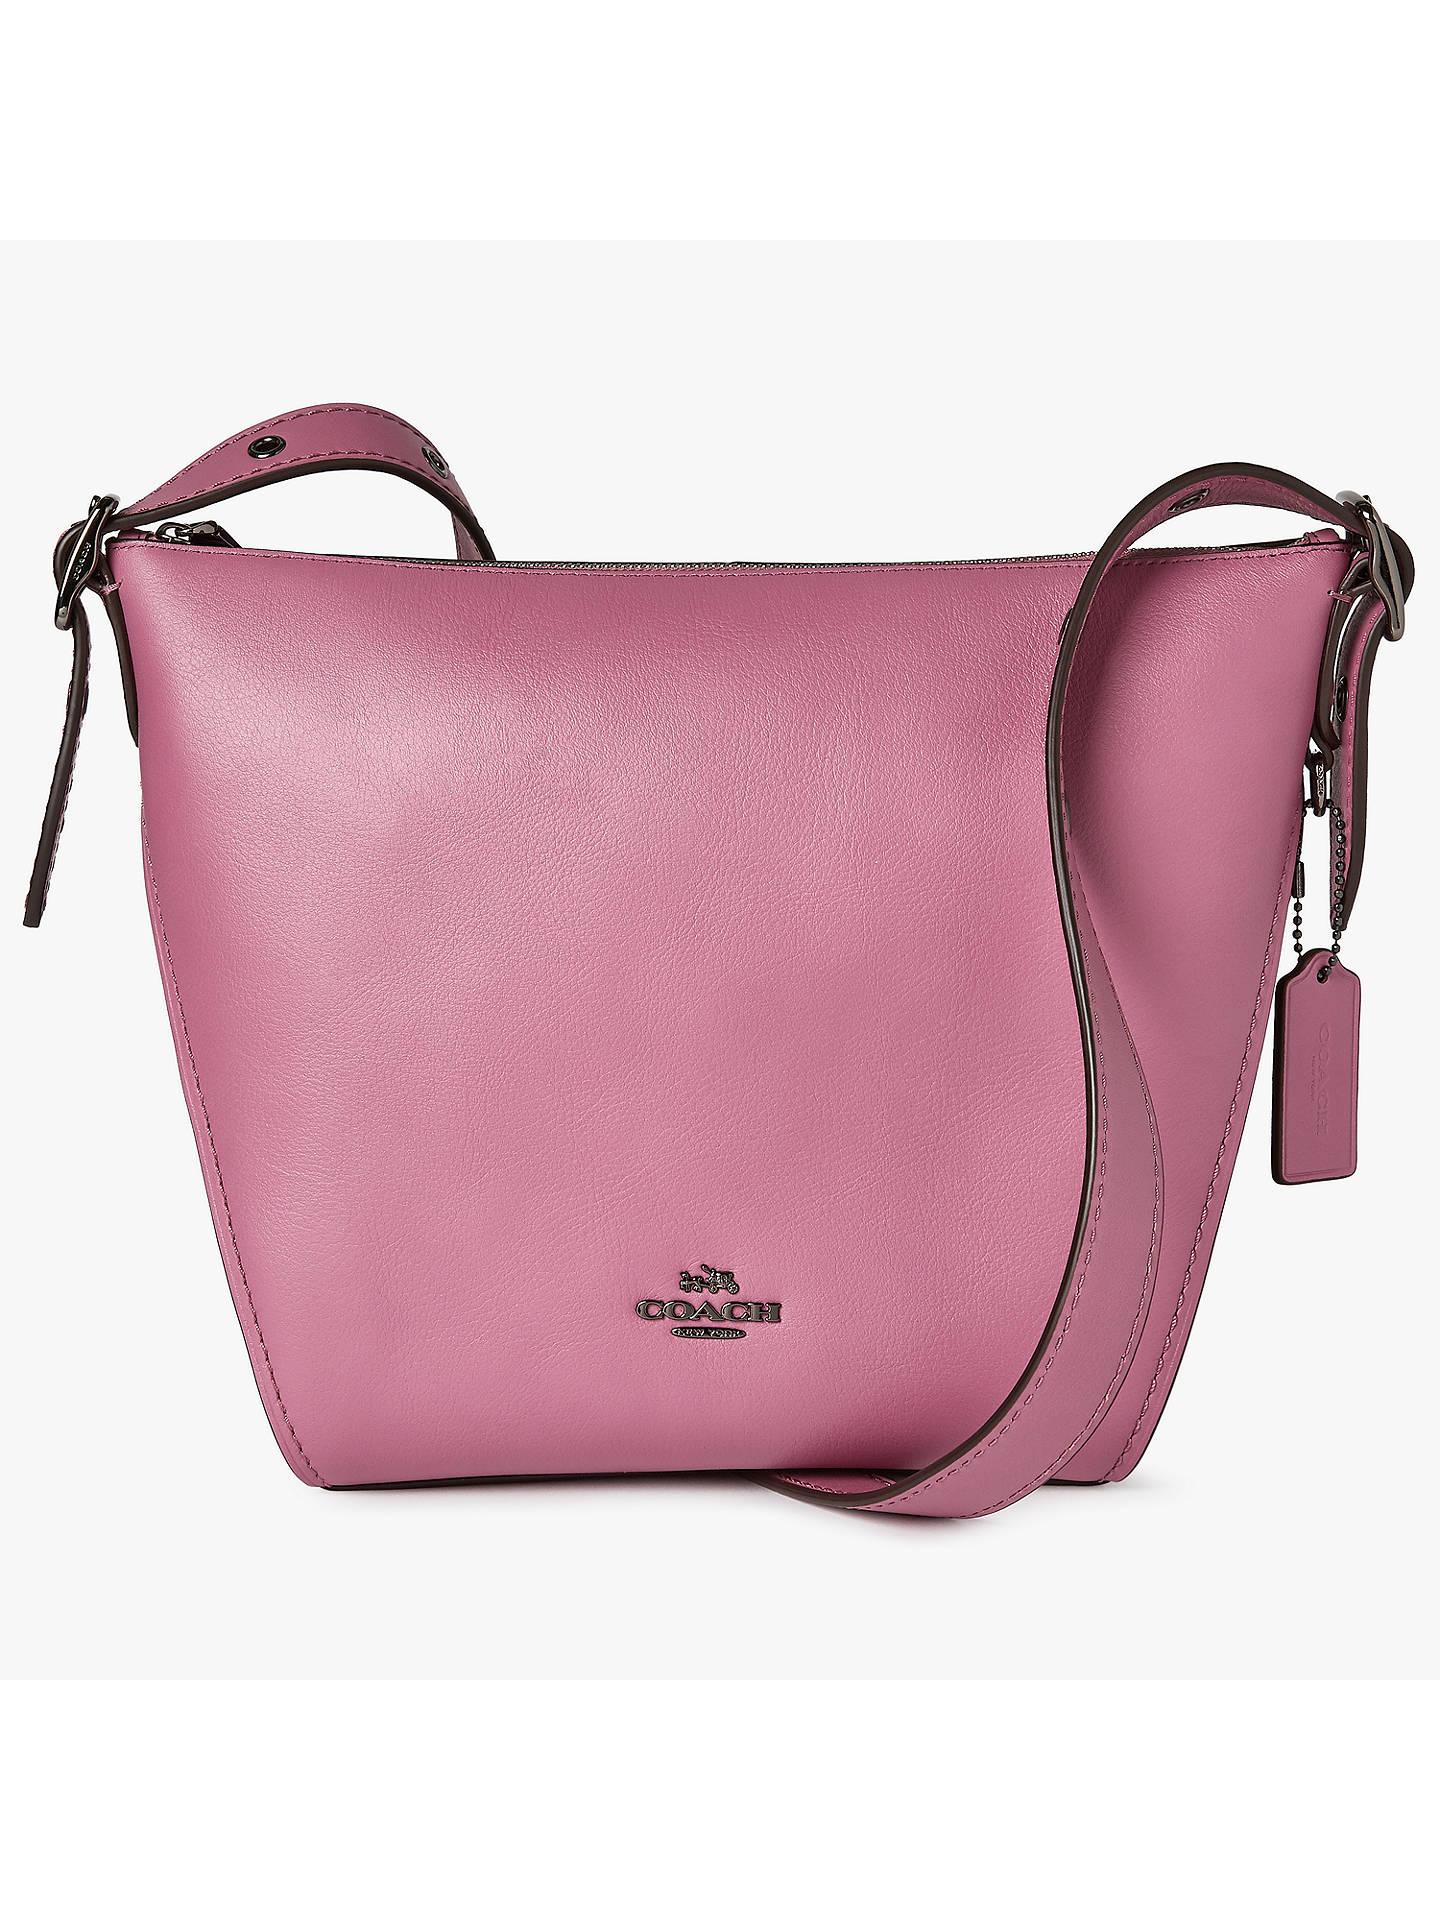 8076ca7024 Coach Dufflette Leather Shoulder Bag at John Lewis   Partners